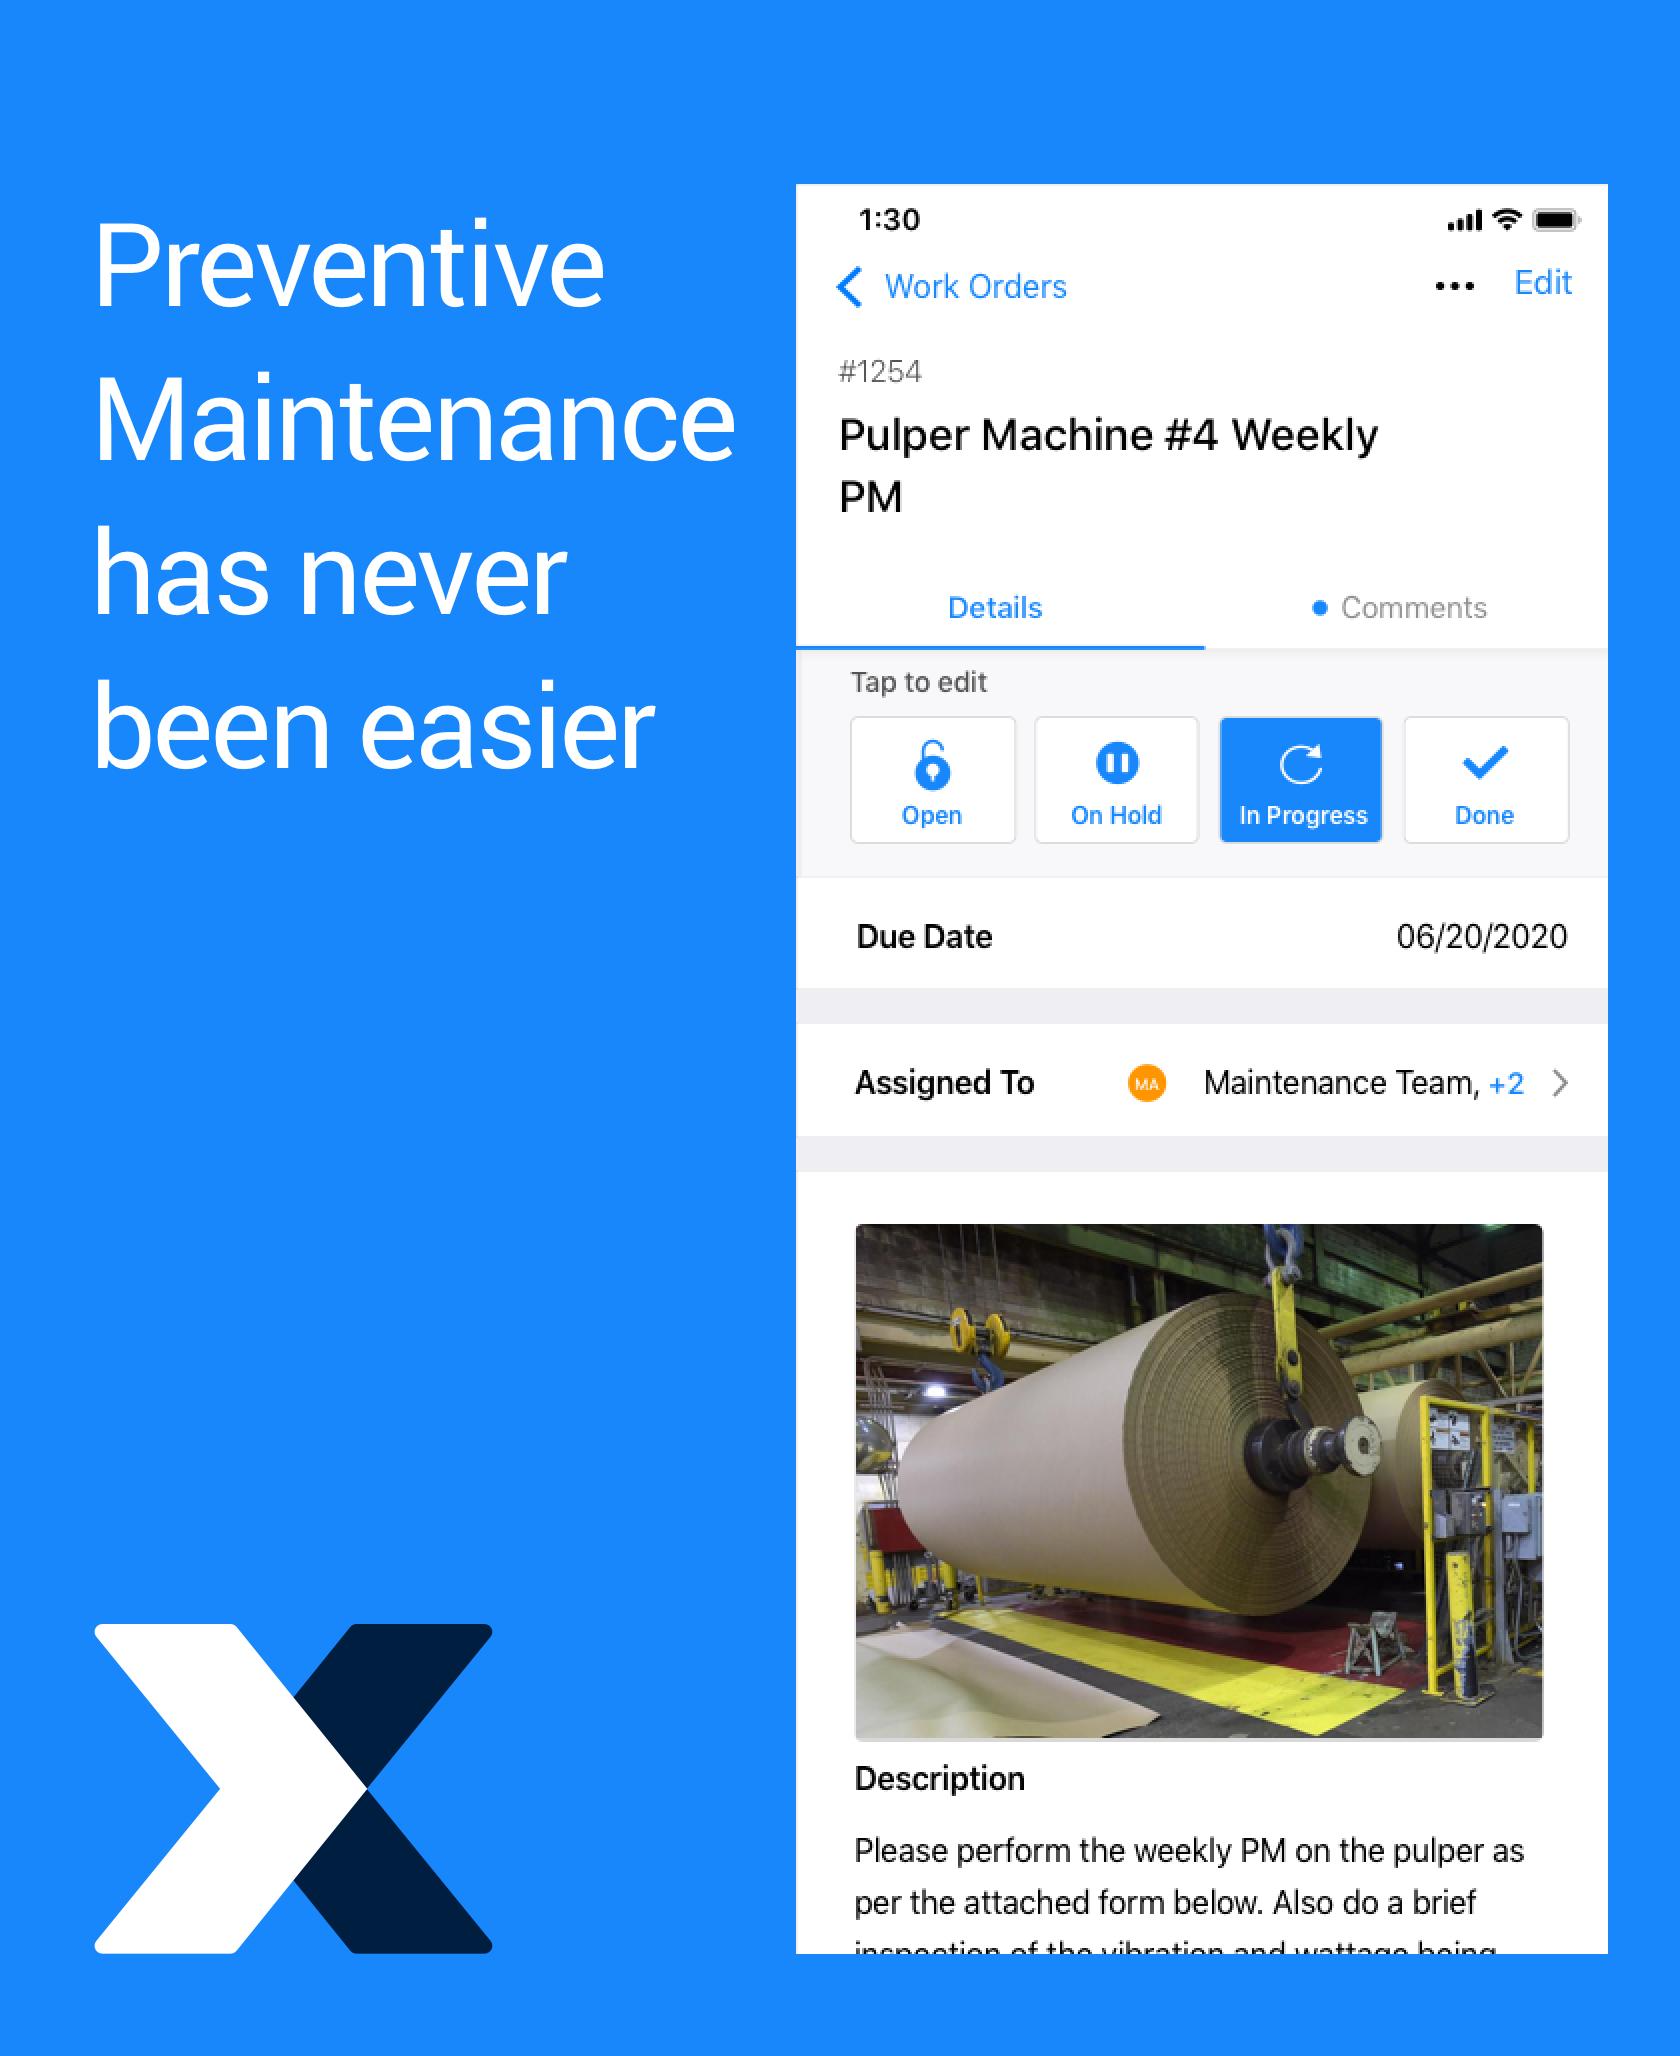 Preventive maintenance has never been easier